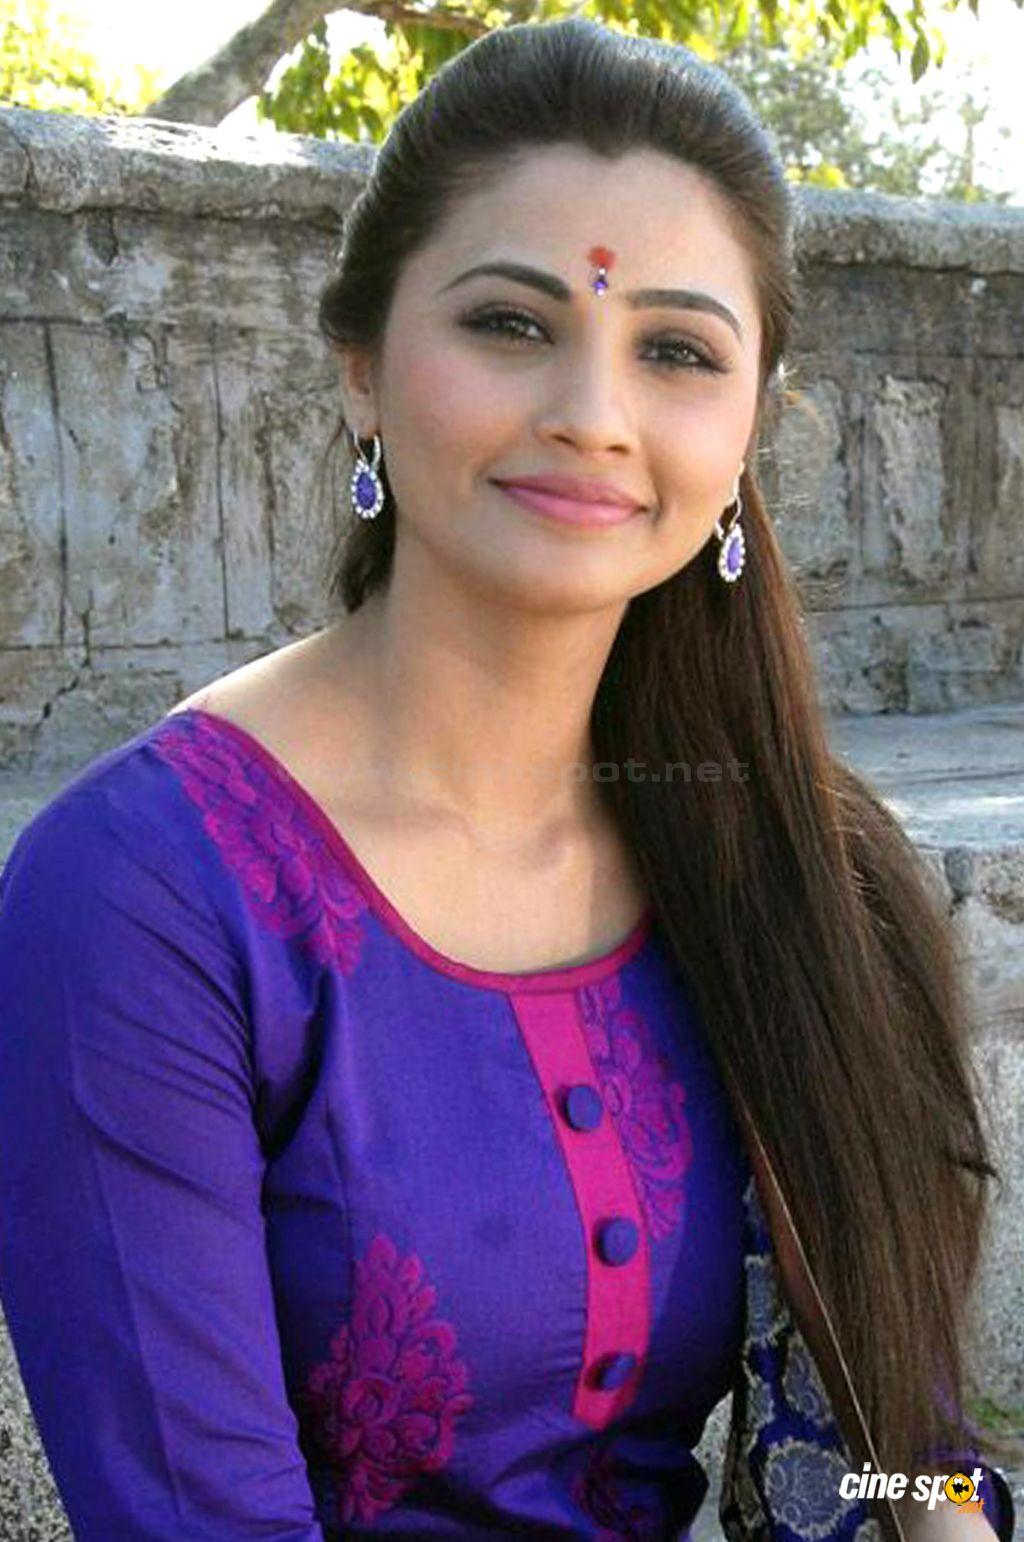 Indian Desi Hot Sexy Girls: Indian Beautiful Desi Girls 2015